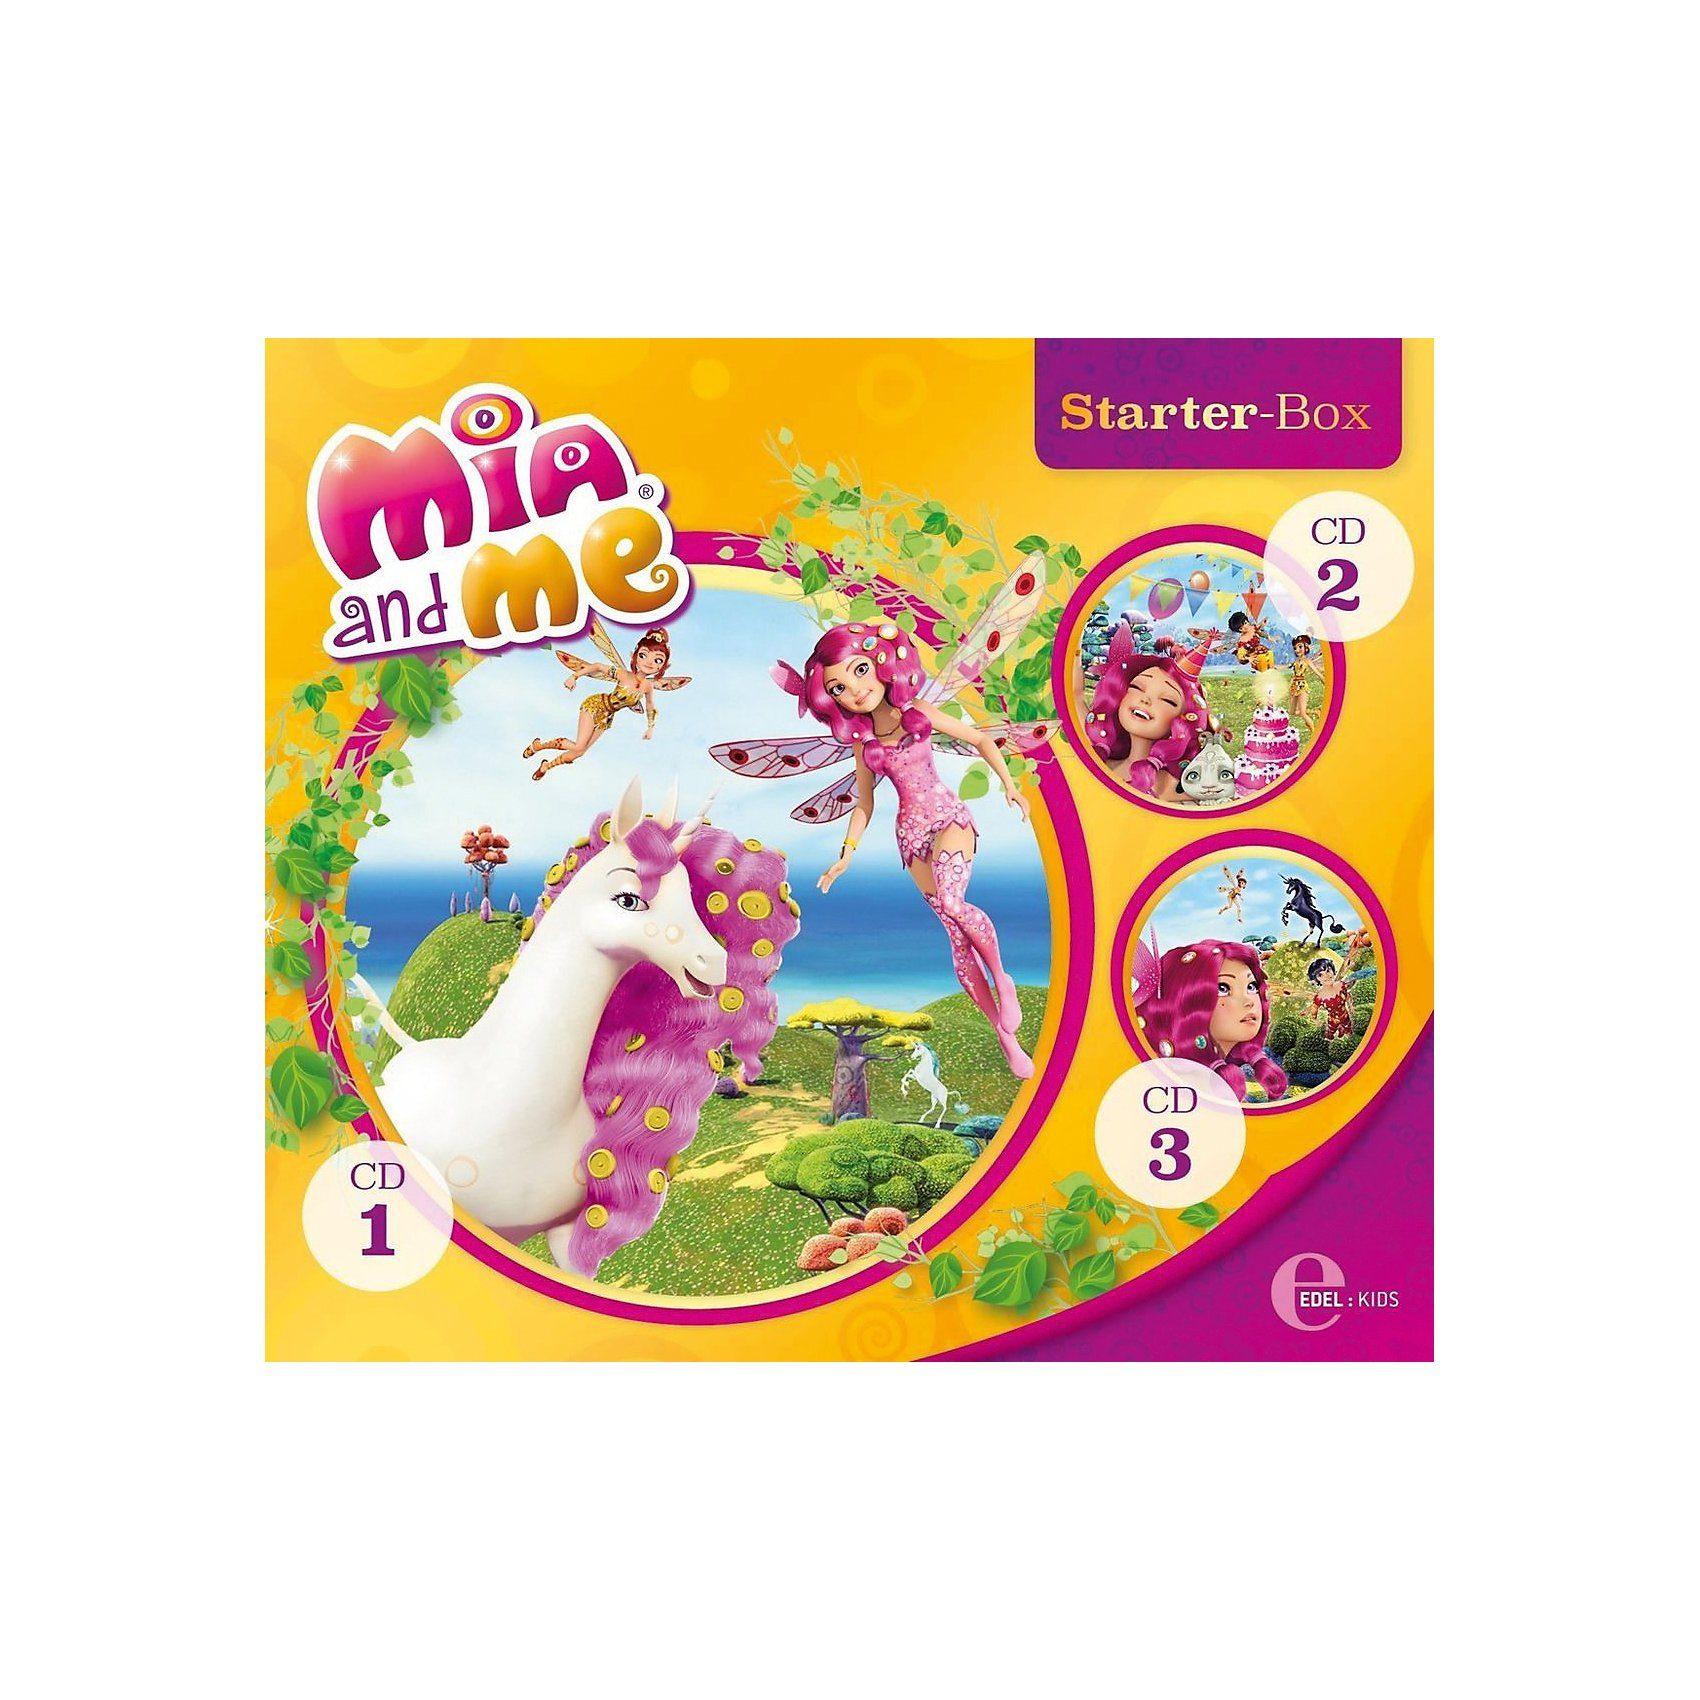 Edel CD Mia and Me- Die Hörspiele zum Buch - Starter-Box 1 (CD 1